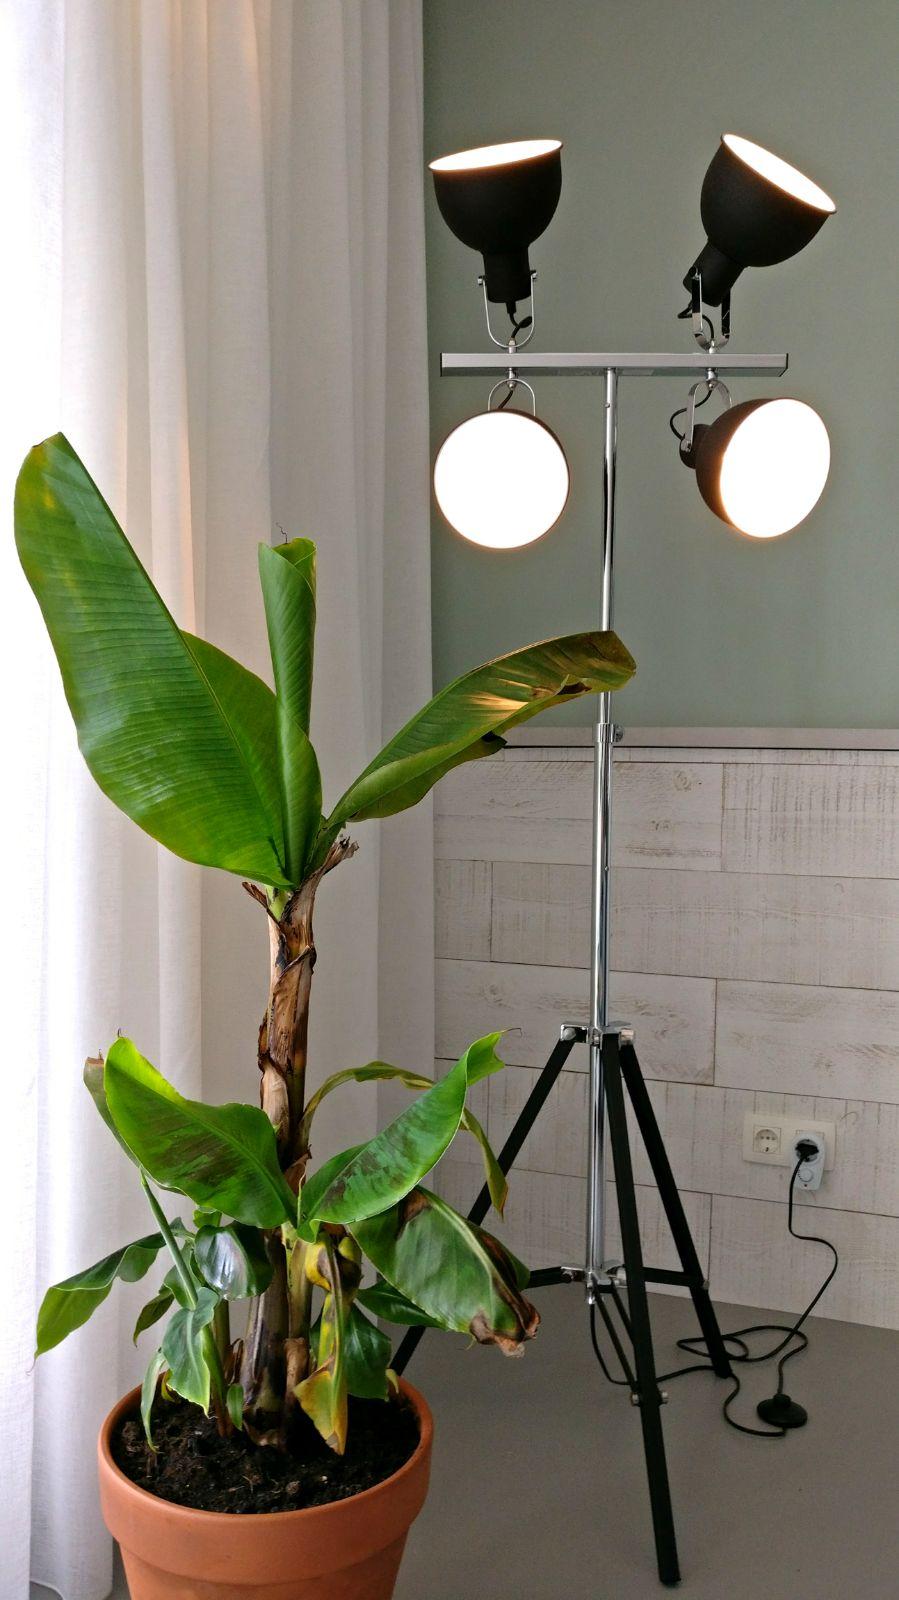 appartement nieuwbouw accessoires industrieel stoer industriële vloerlamp spots bananen plant urban jungle.jpg